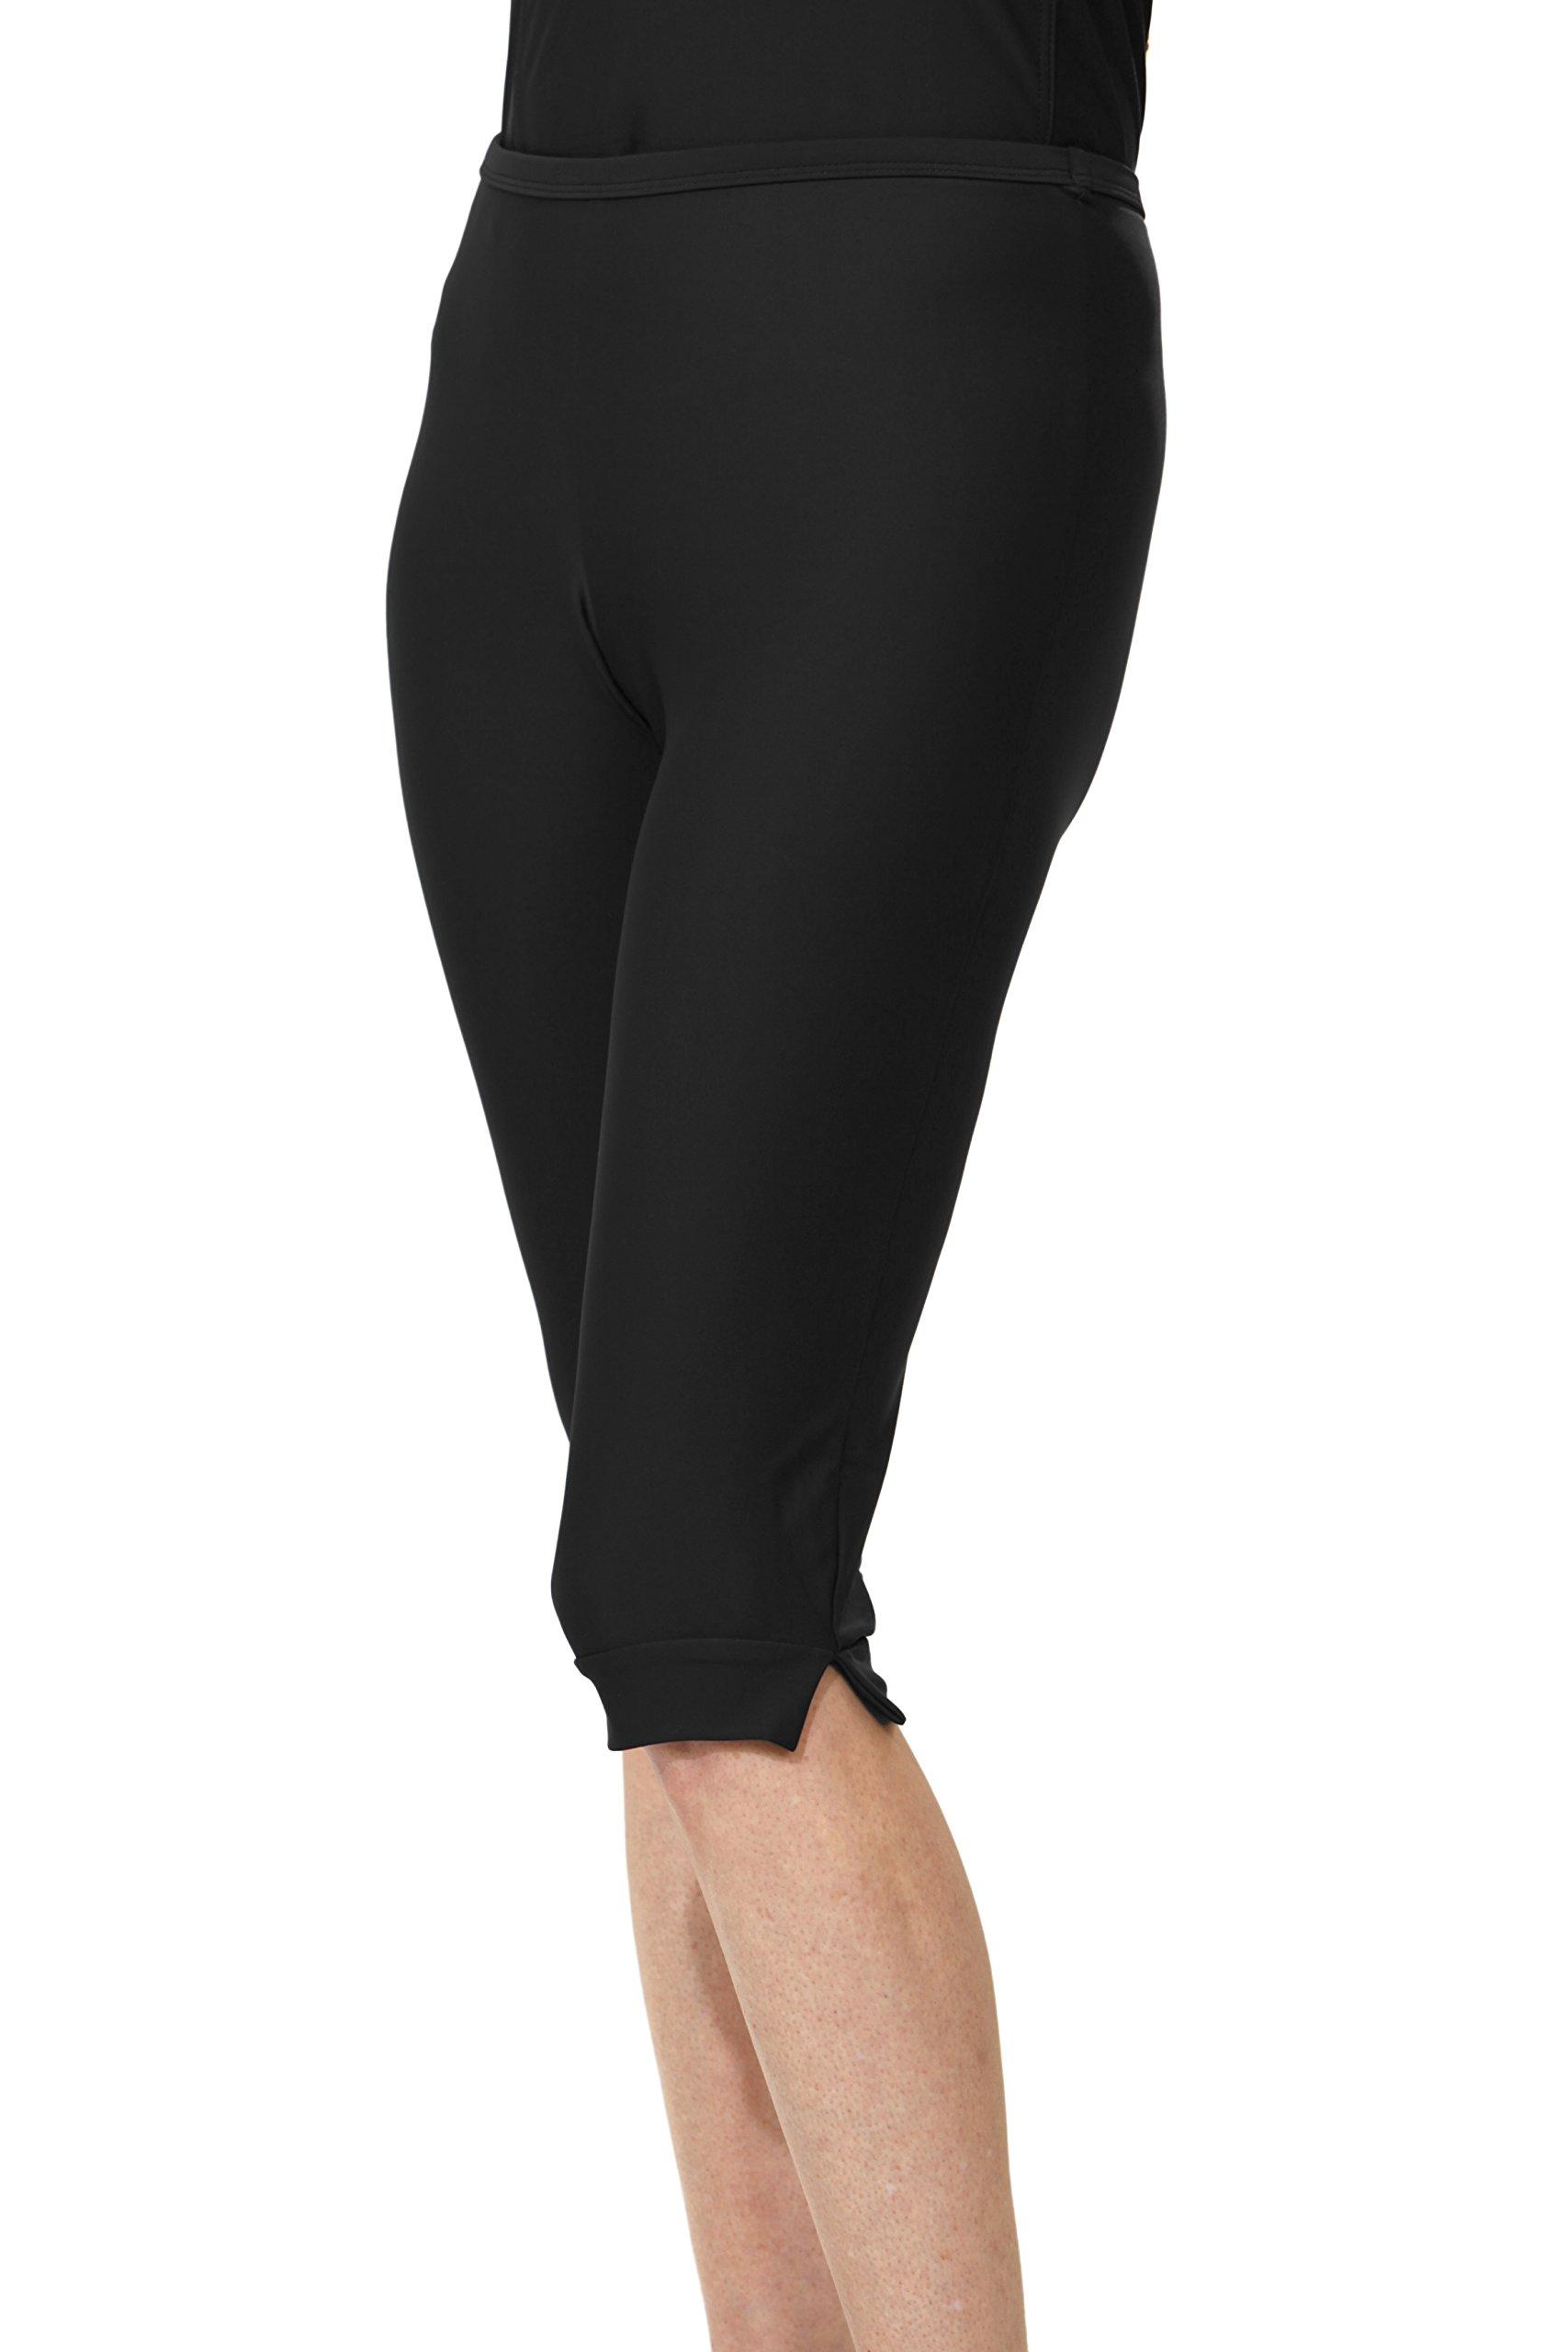 HydroChic Women's Modest Swim Shorts – Pedal Pusher Style Swimwear (Black, X-Small)